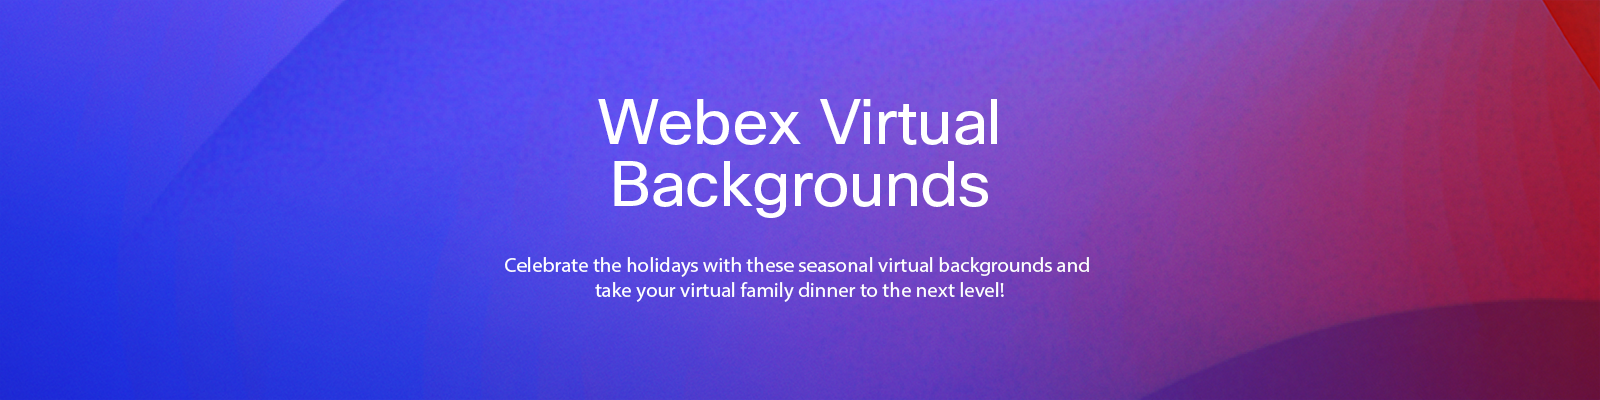 Webex Virtual Backgrounds